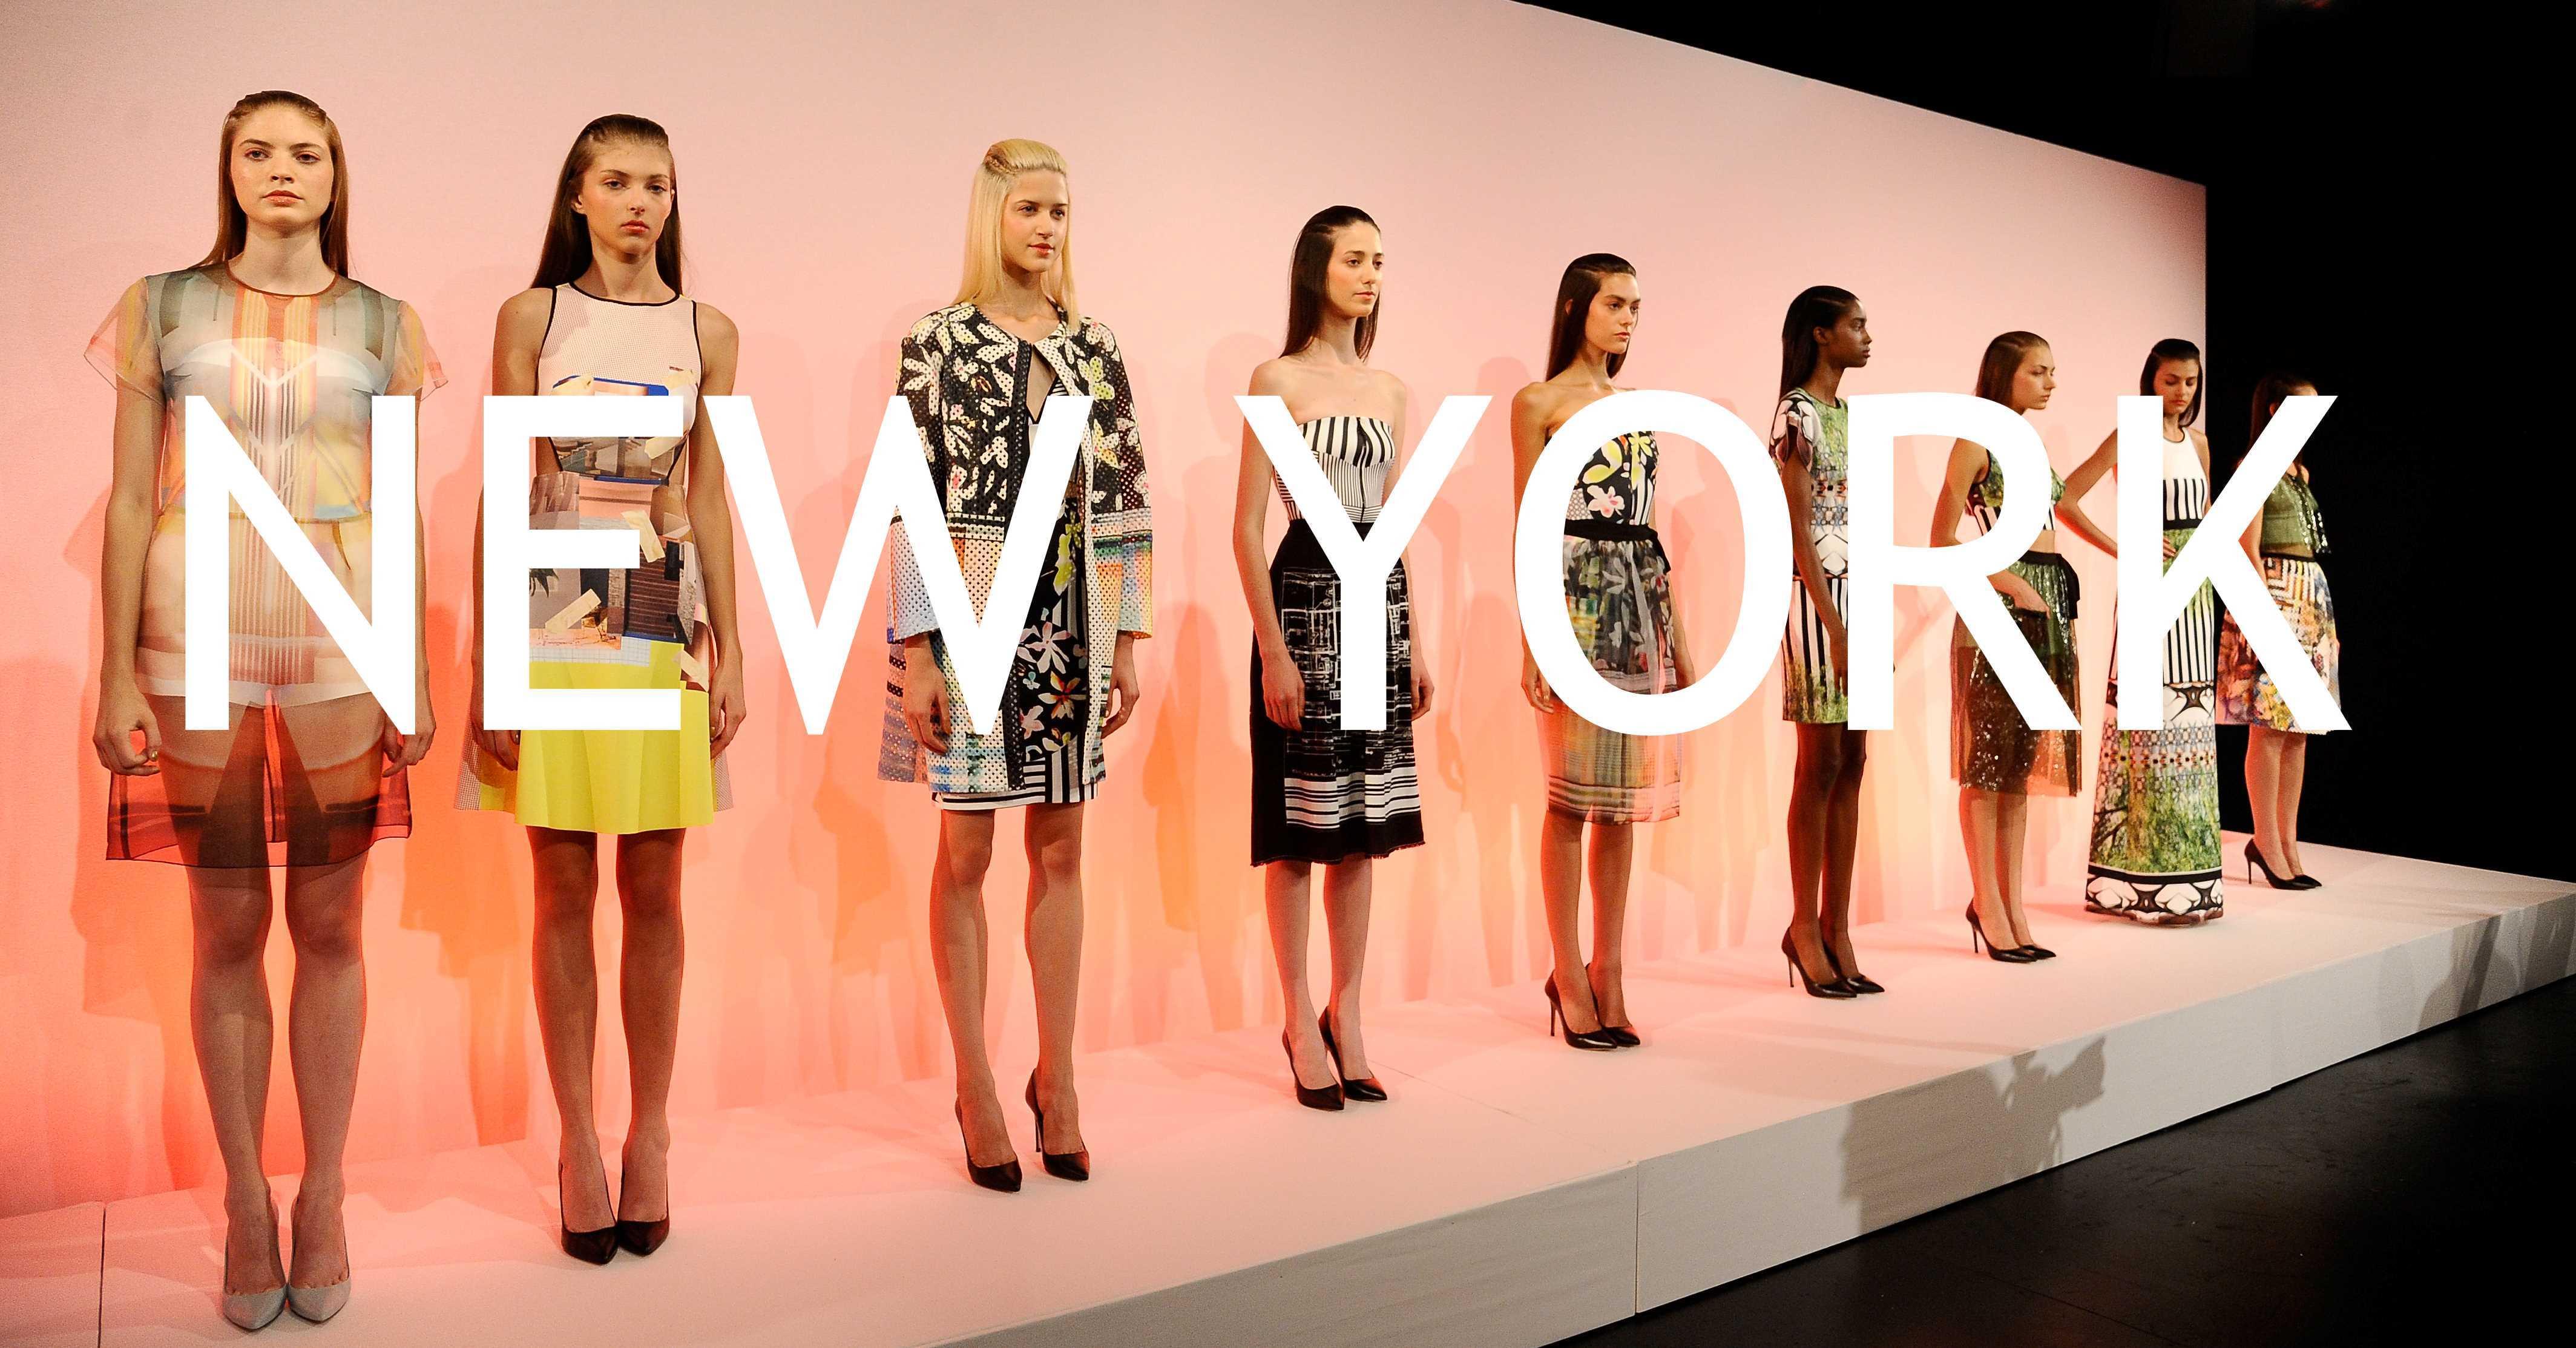 New York Fashion Week Neglects Ethics